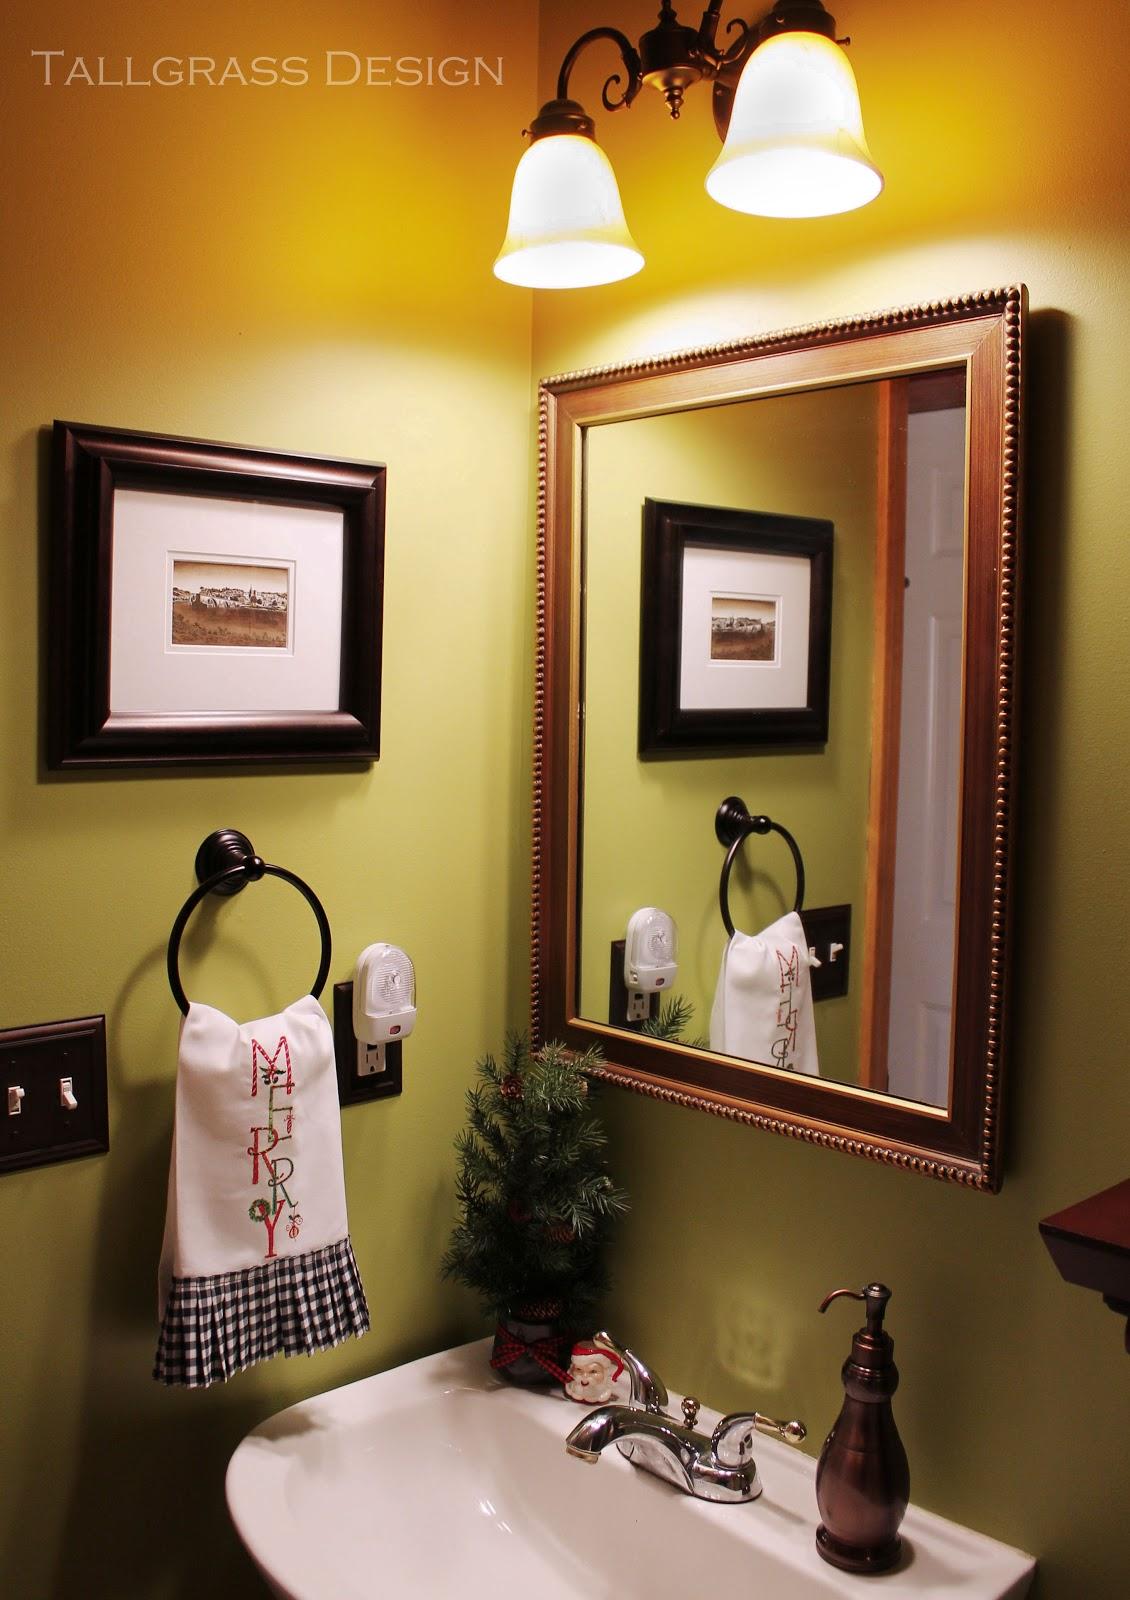 Luxury Powder Room Wall Ideas Inspiration - The Wall Art Decorations ...